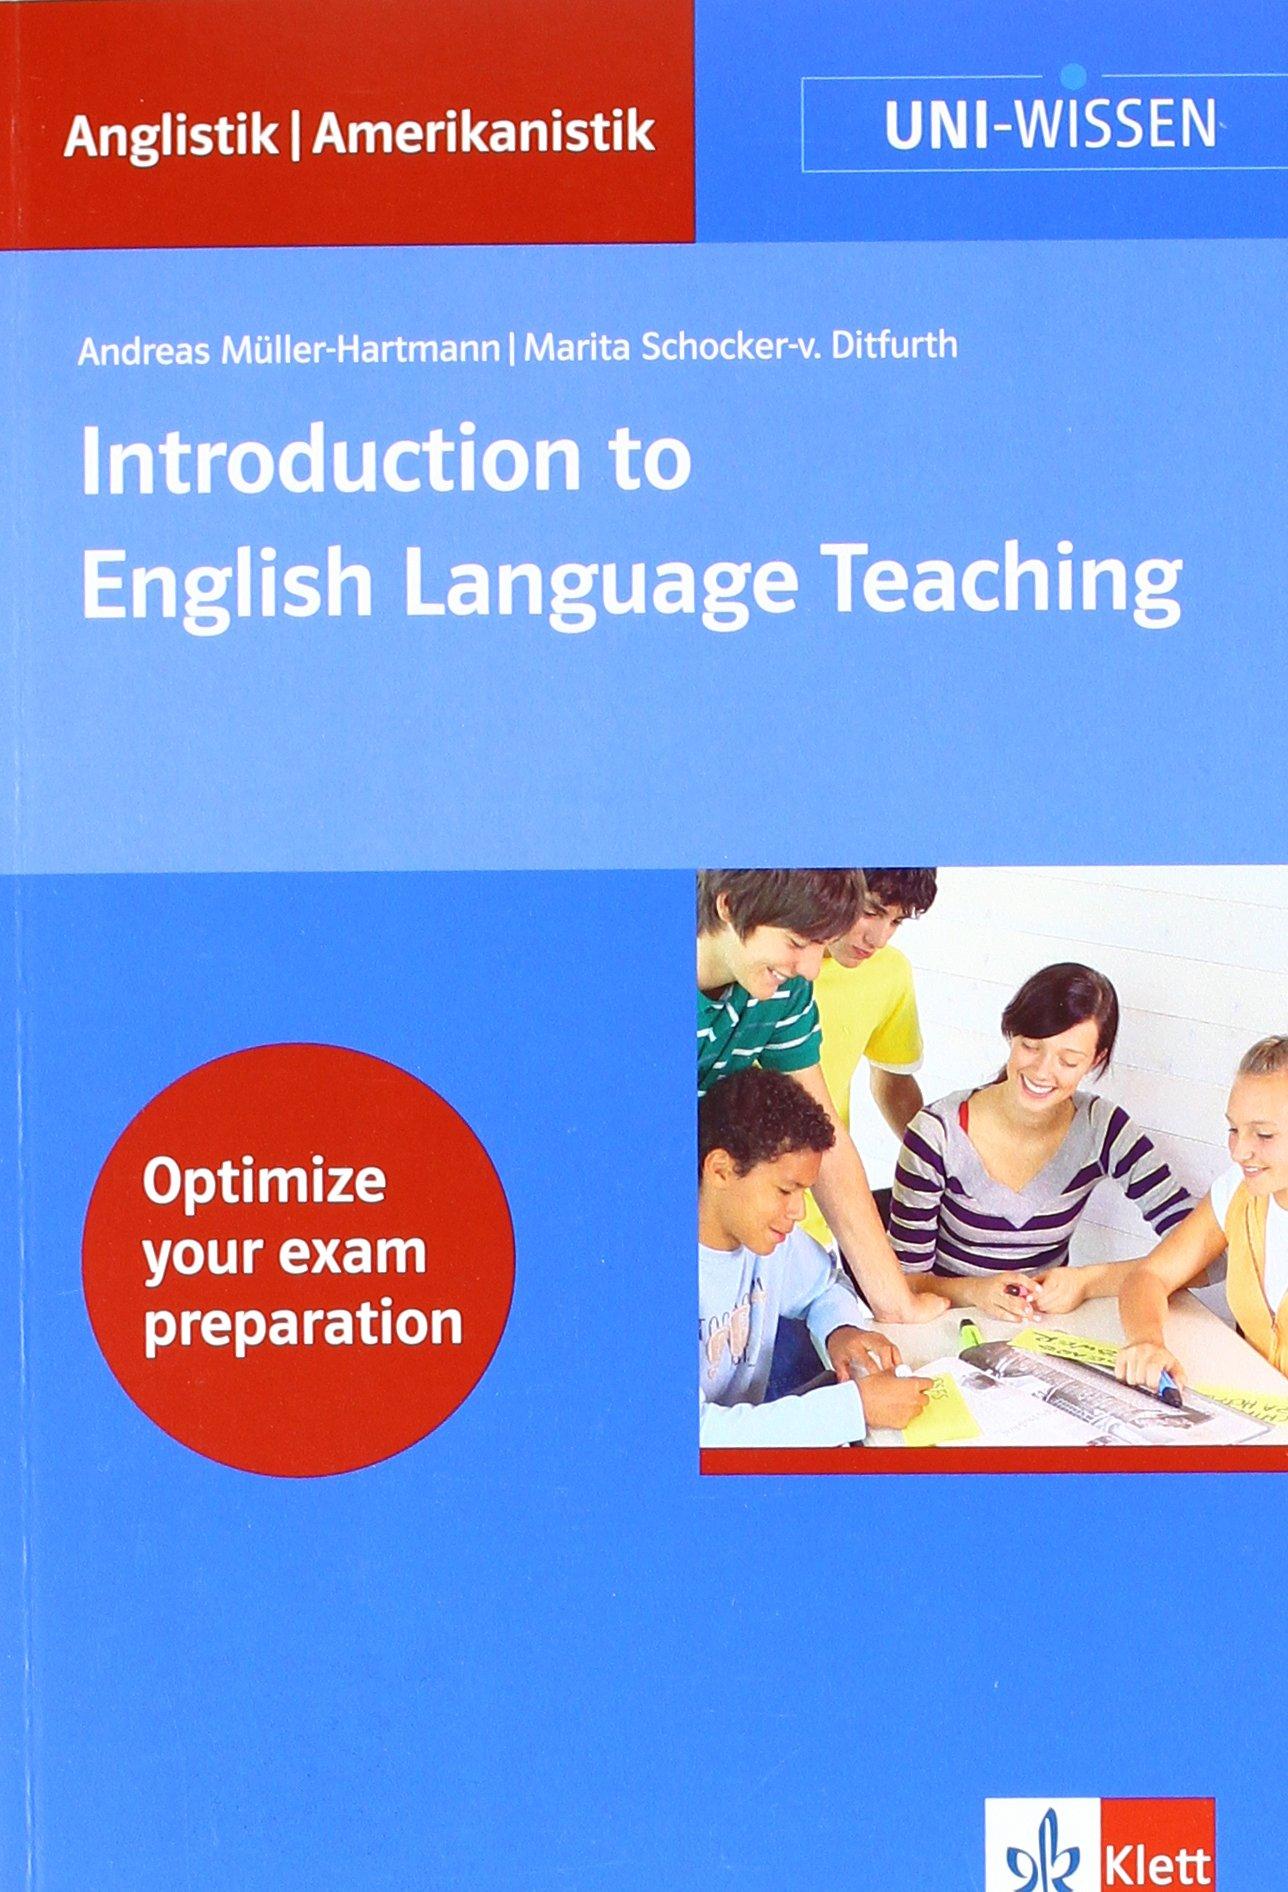 Introduction to English Language Teaching (Uni-Wissen Anglistik/Amerikanistik)